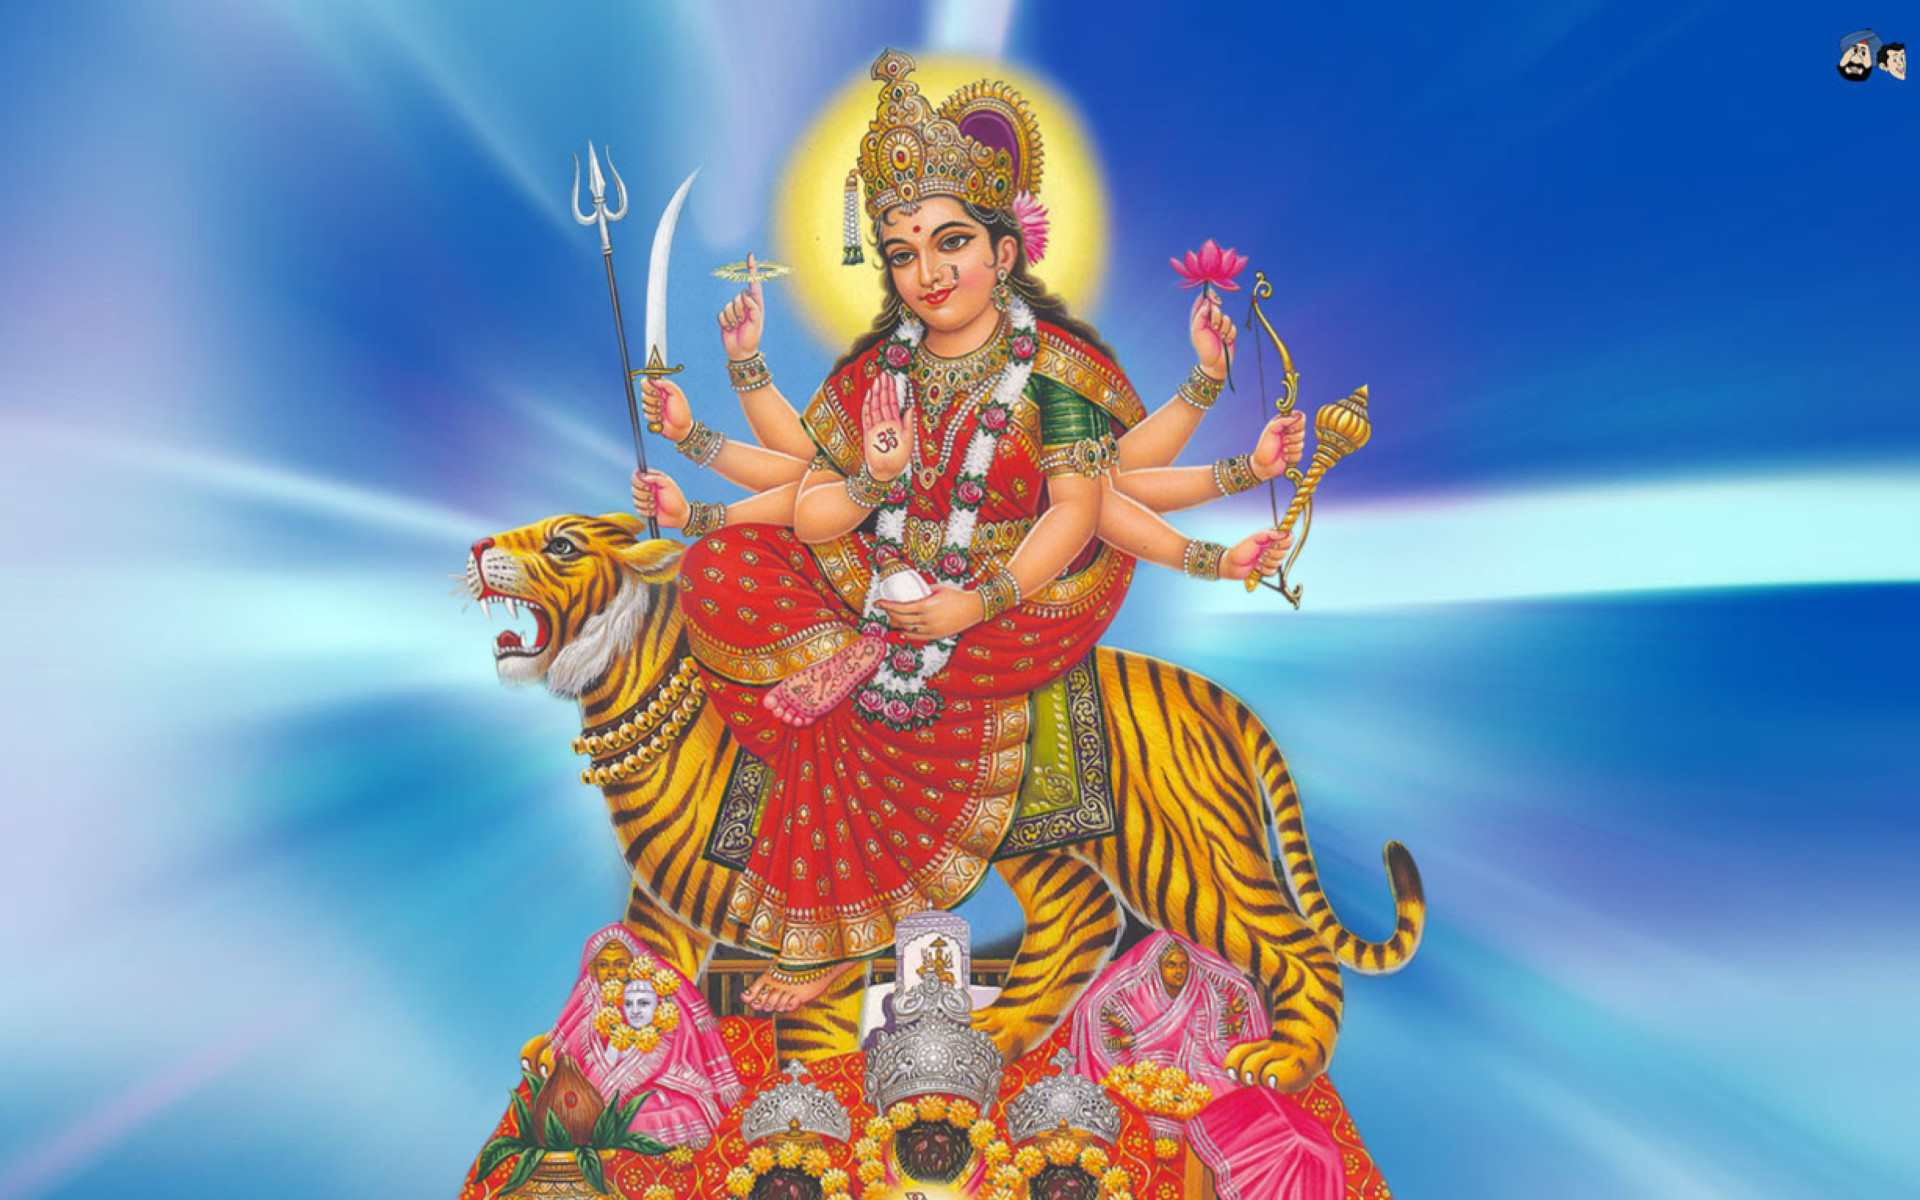 Hindu God Full Hd Wallpaper   Data-src - Hindu God Full Hd - HD Wallpaper